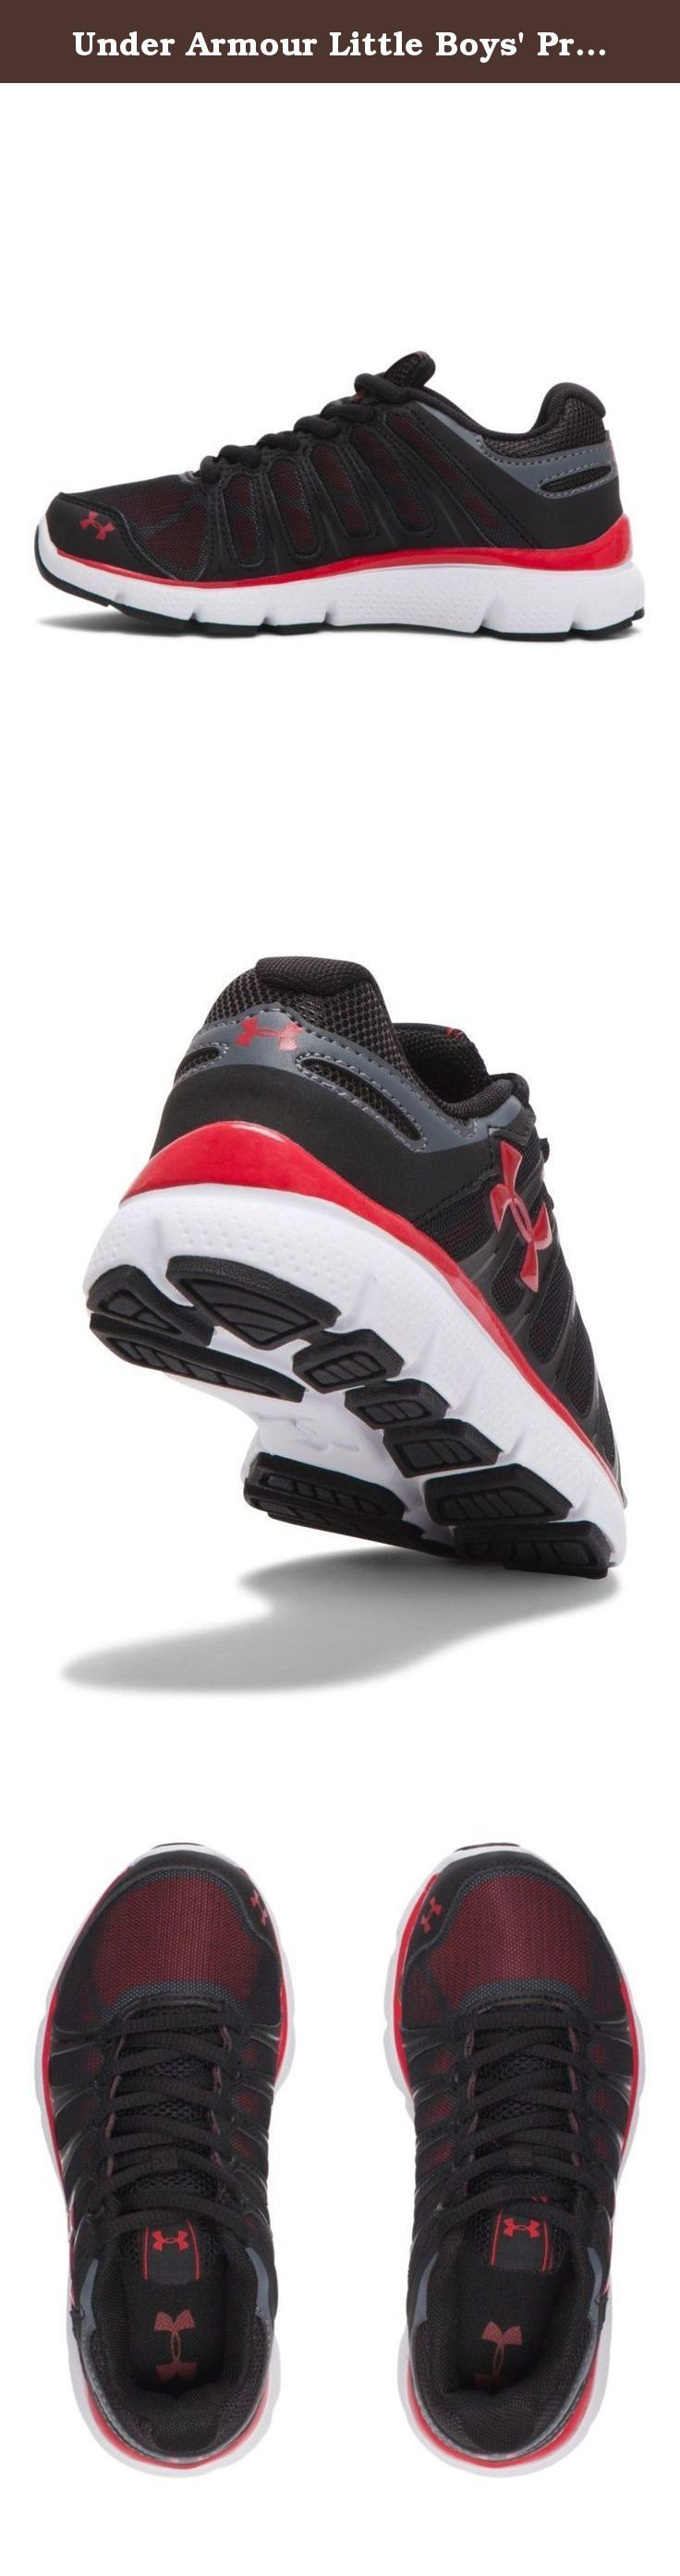 Under Armour Little Boys' Pre-School UA Pulse II Shoes 1 Black.